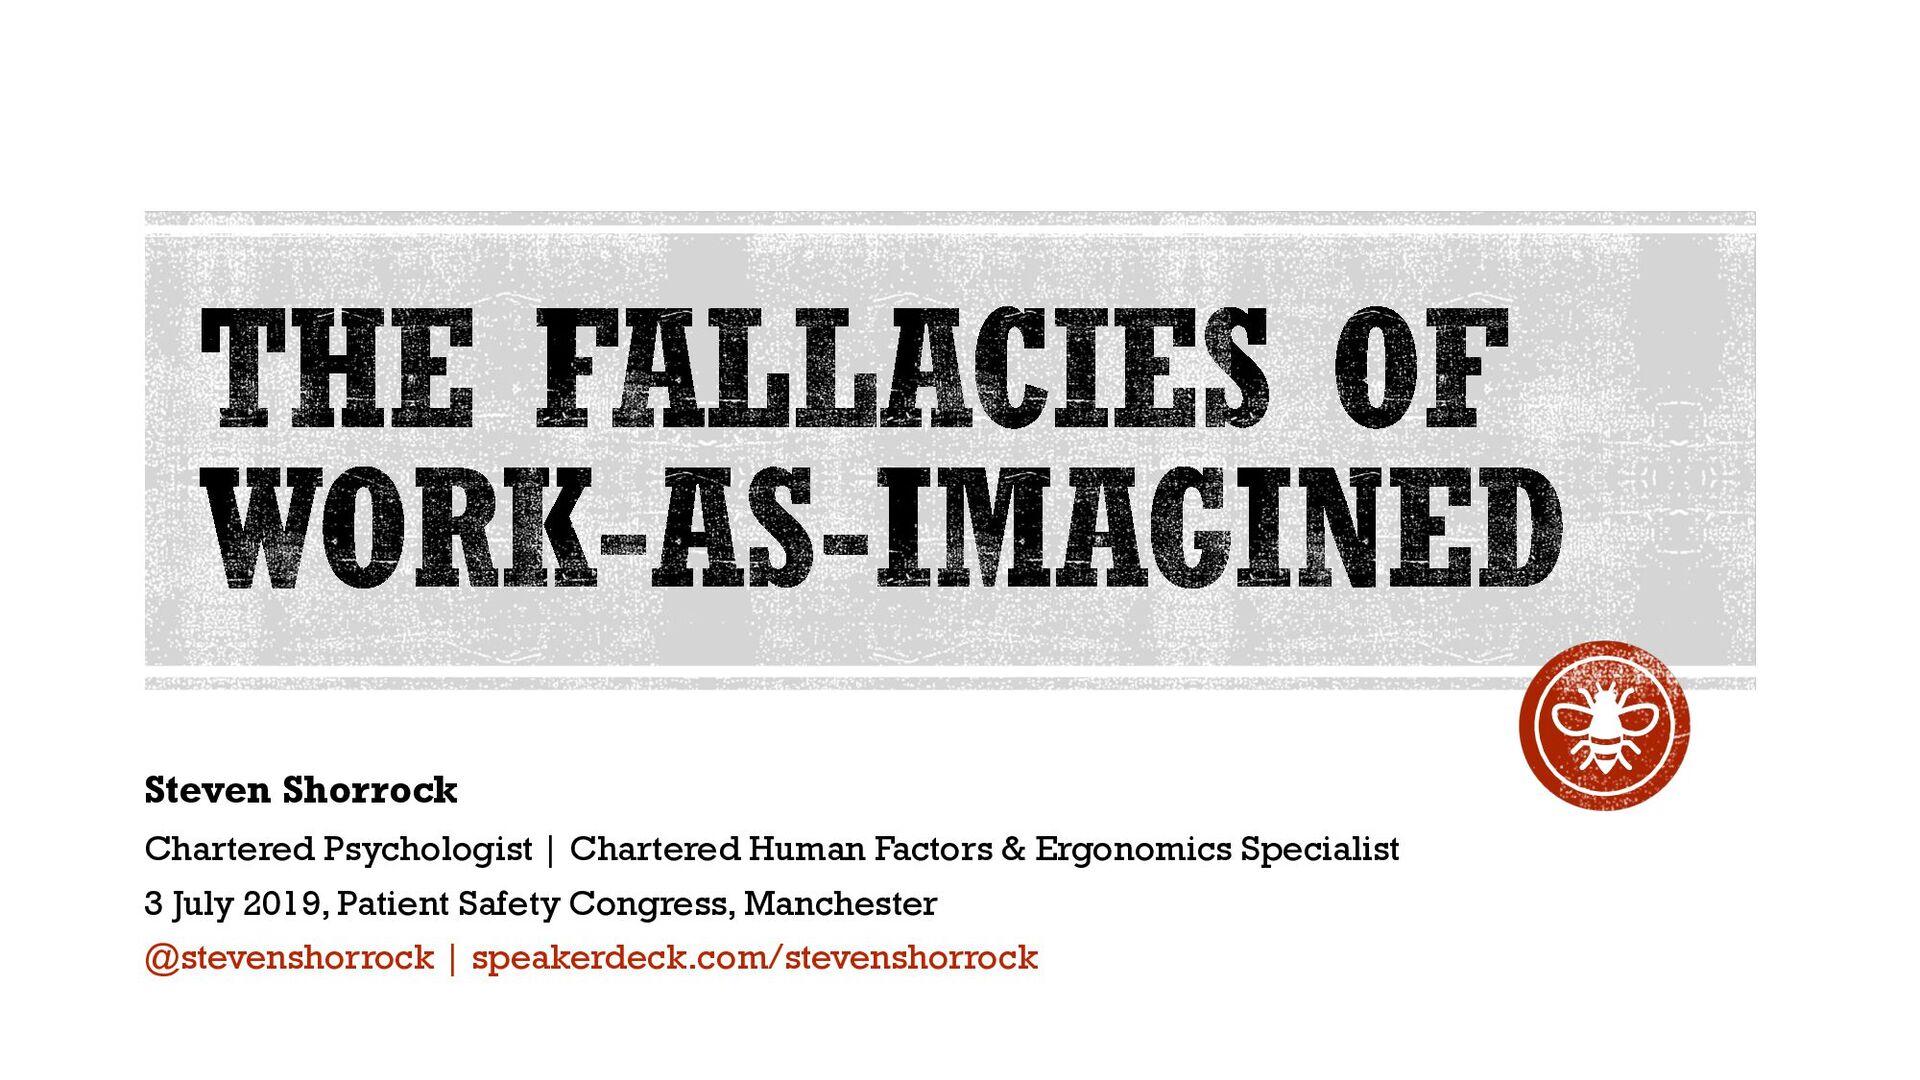 Steven Shorrock Chartered Psychologist | Charte...